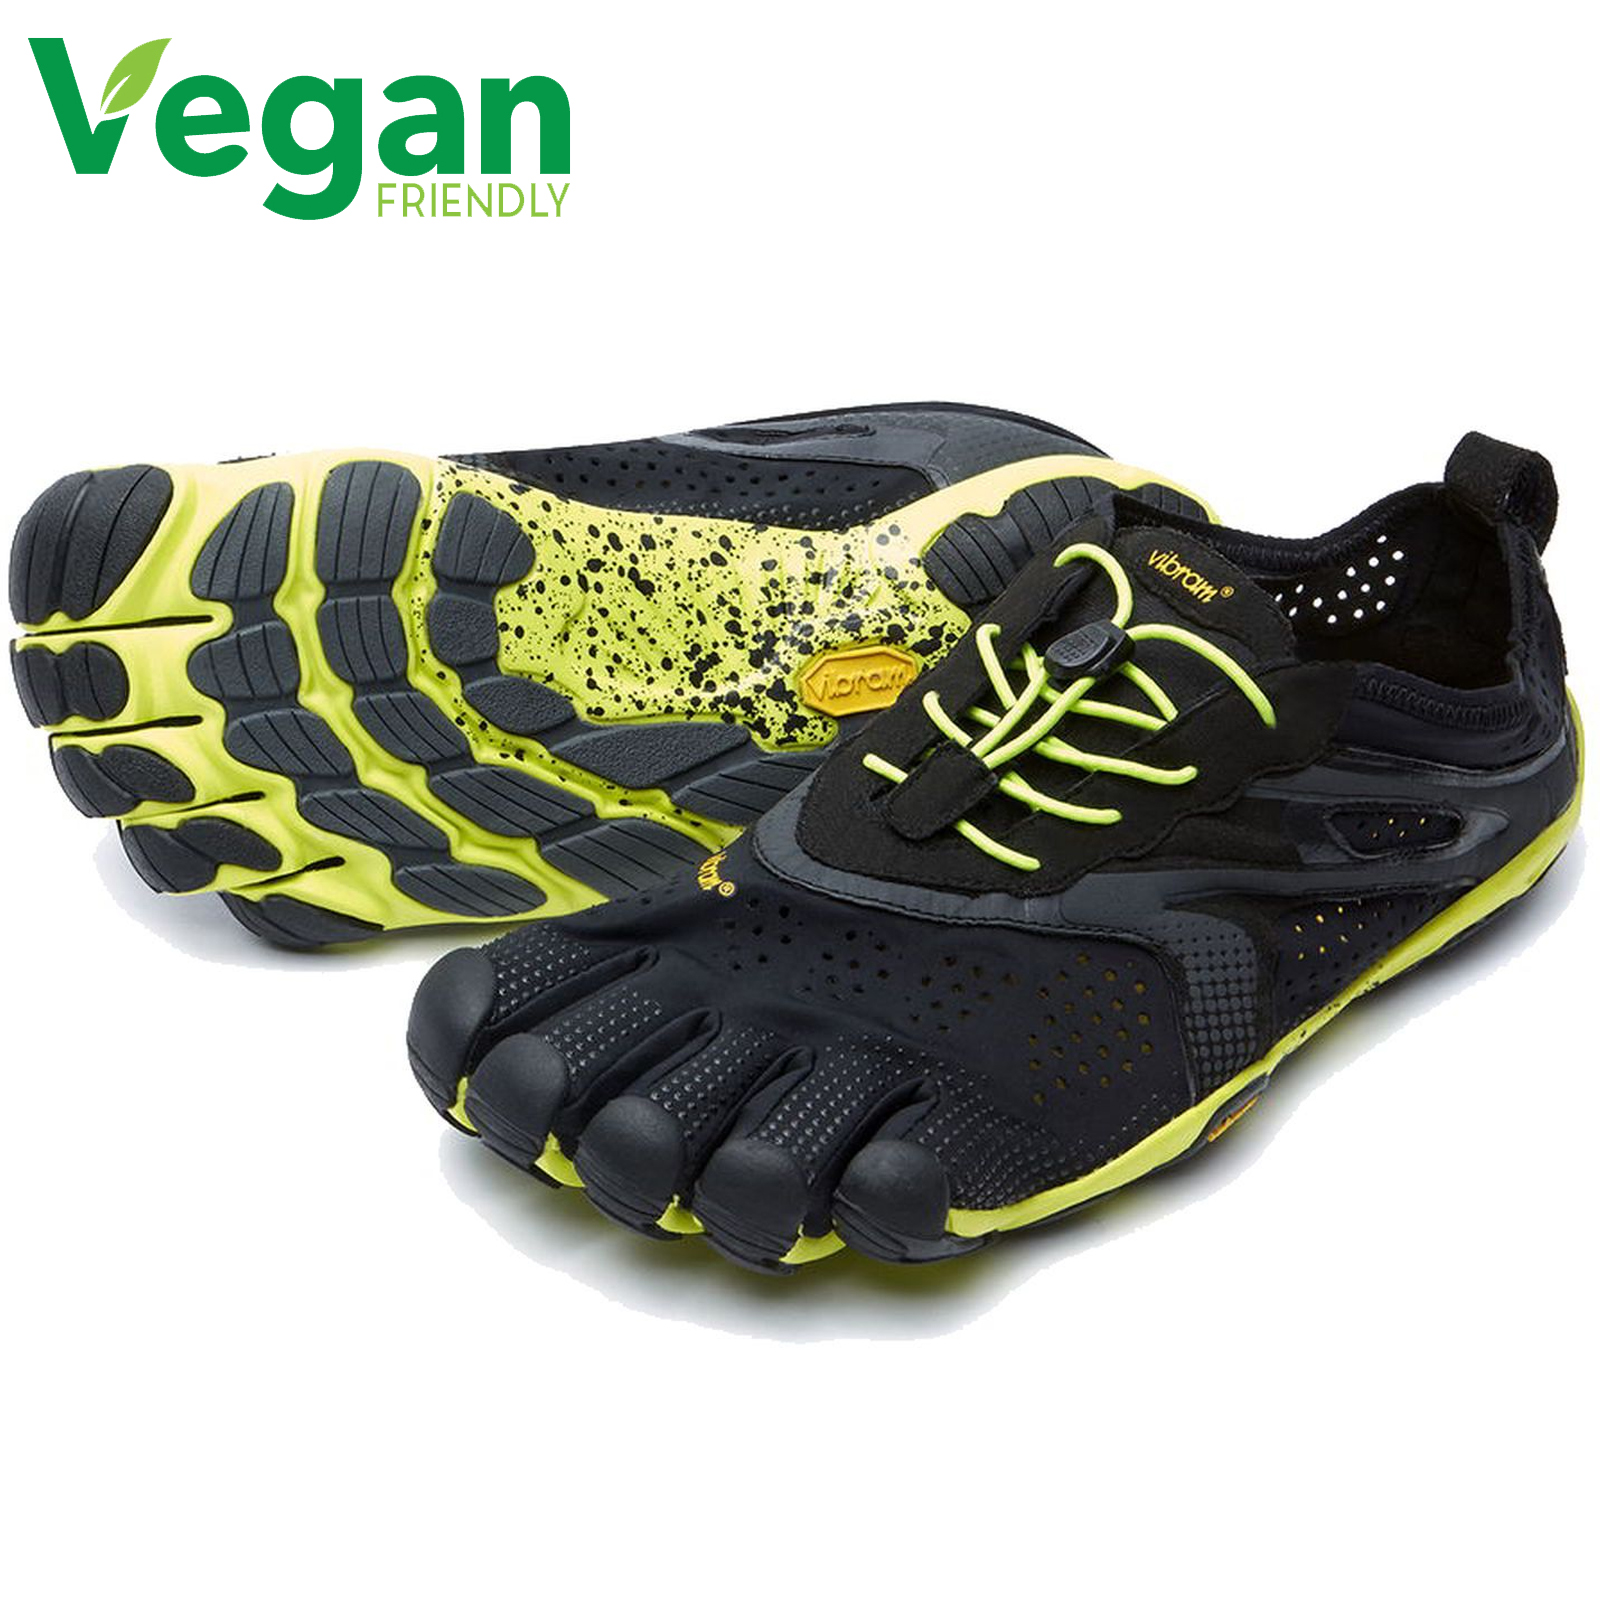 Vibram Five Fingers Mens V-Run Vegan Barefoot Shoes - Black Yellow